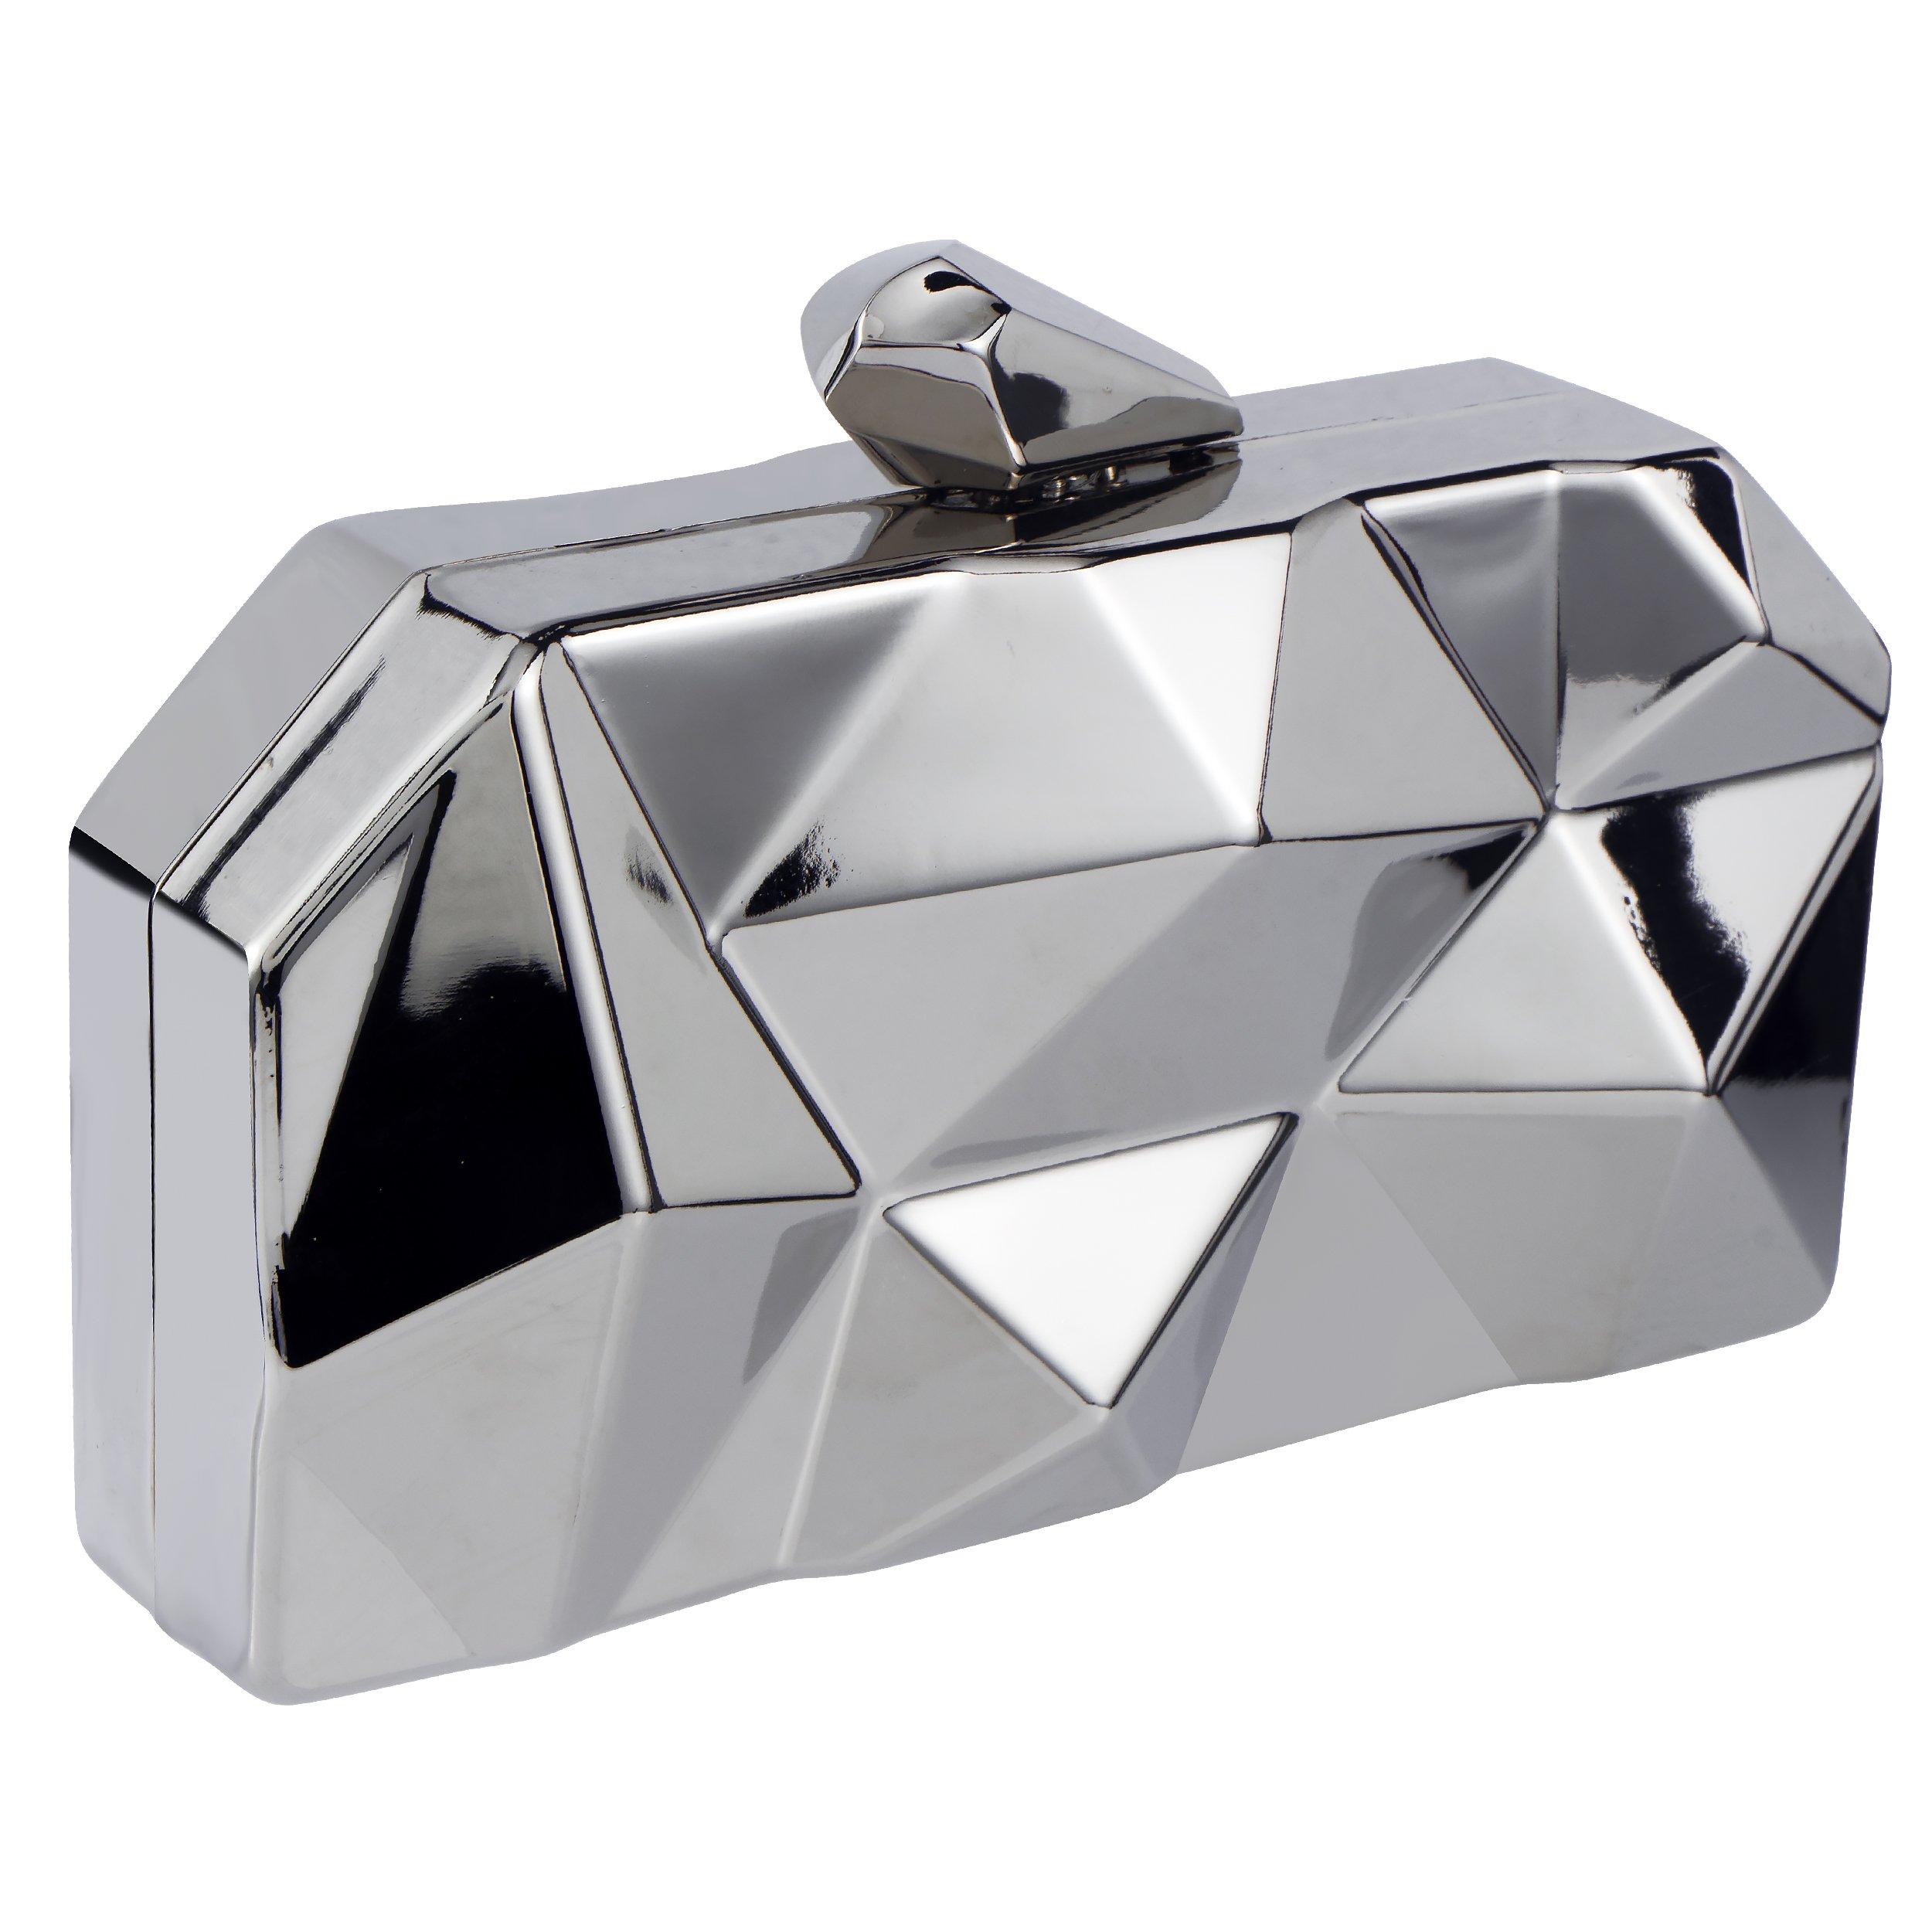 Bagood Women's Evening Bags Clutches Purses Metal Diamond Handbag Shoulder Bag for Wedding Bridal Prom Party Silver